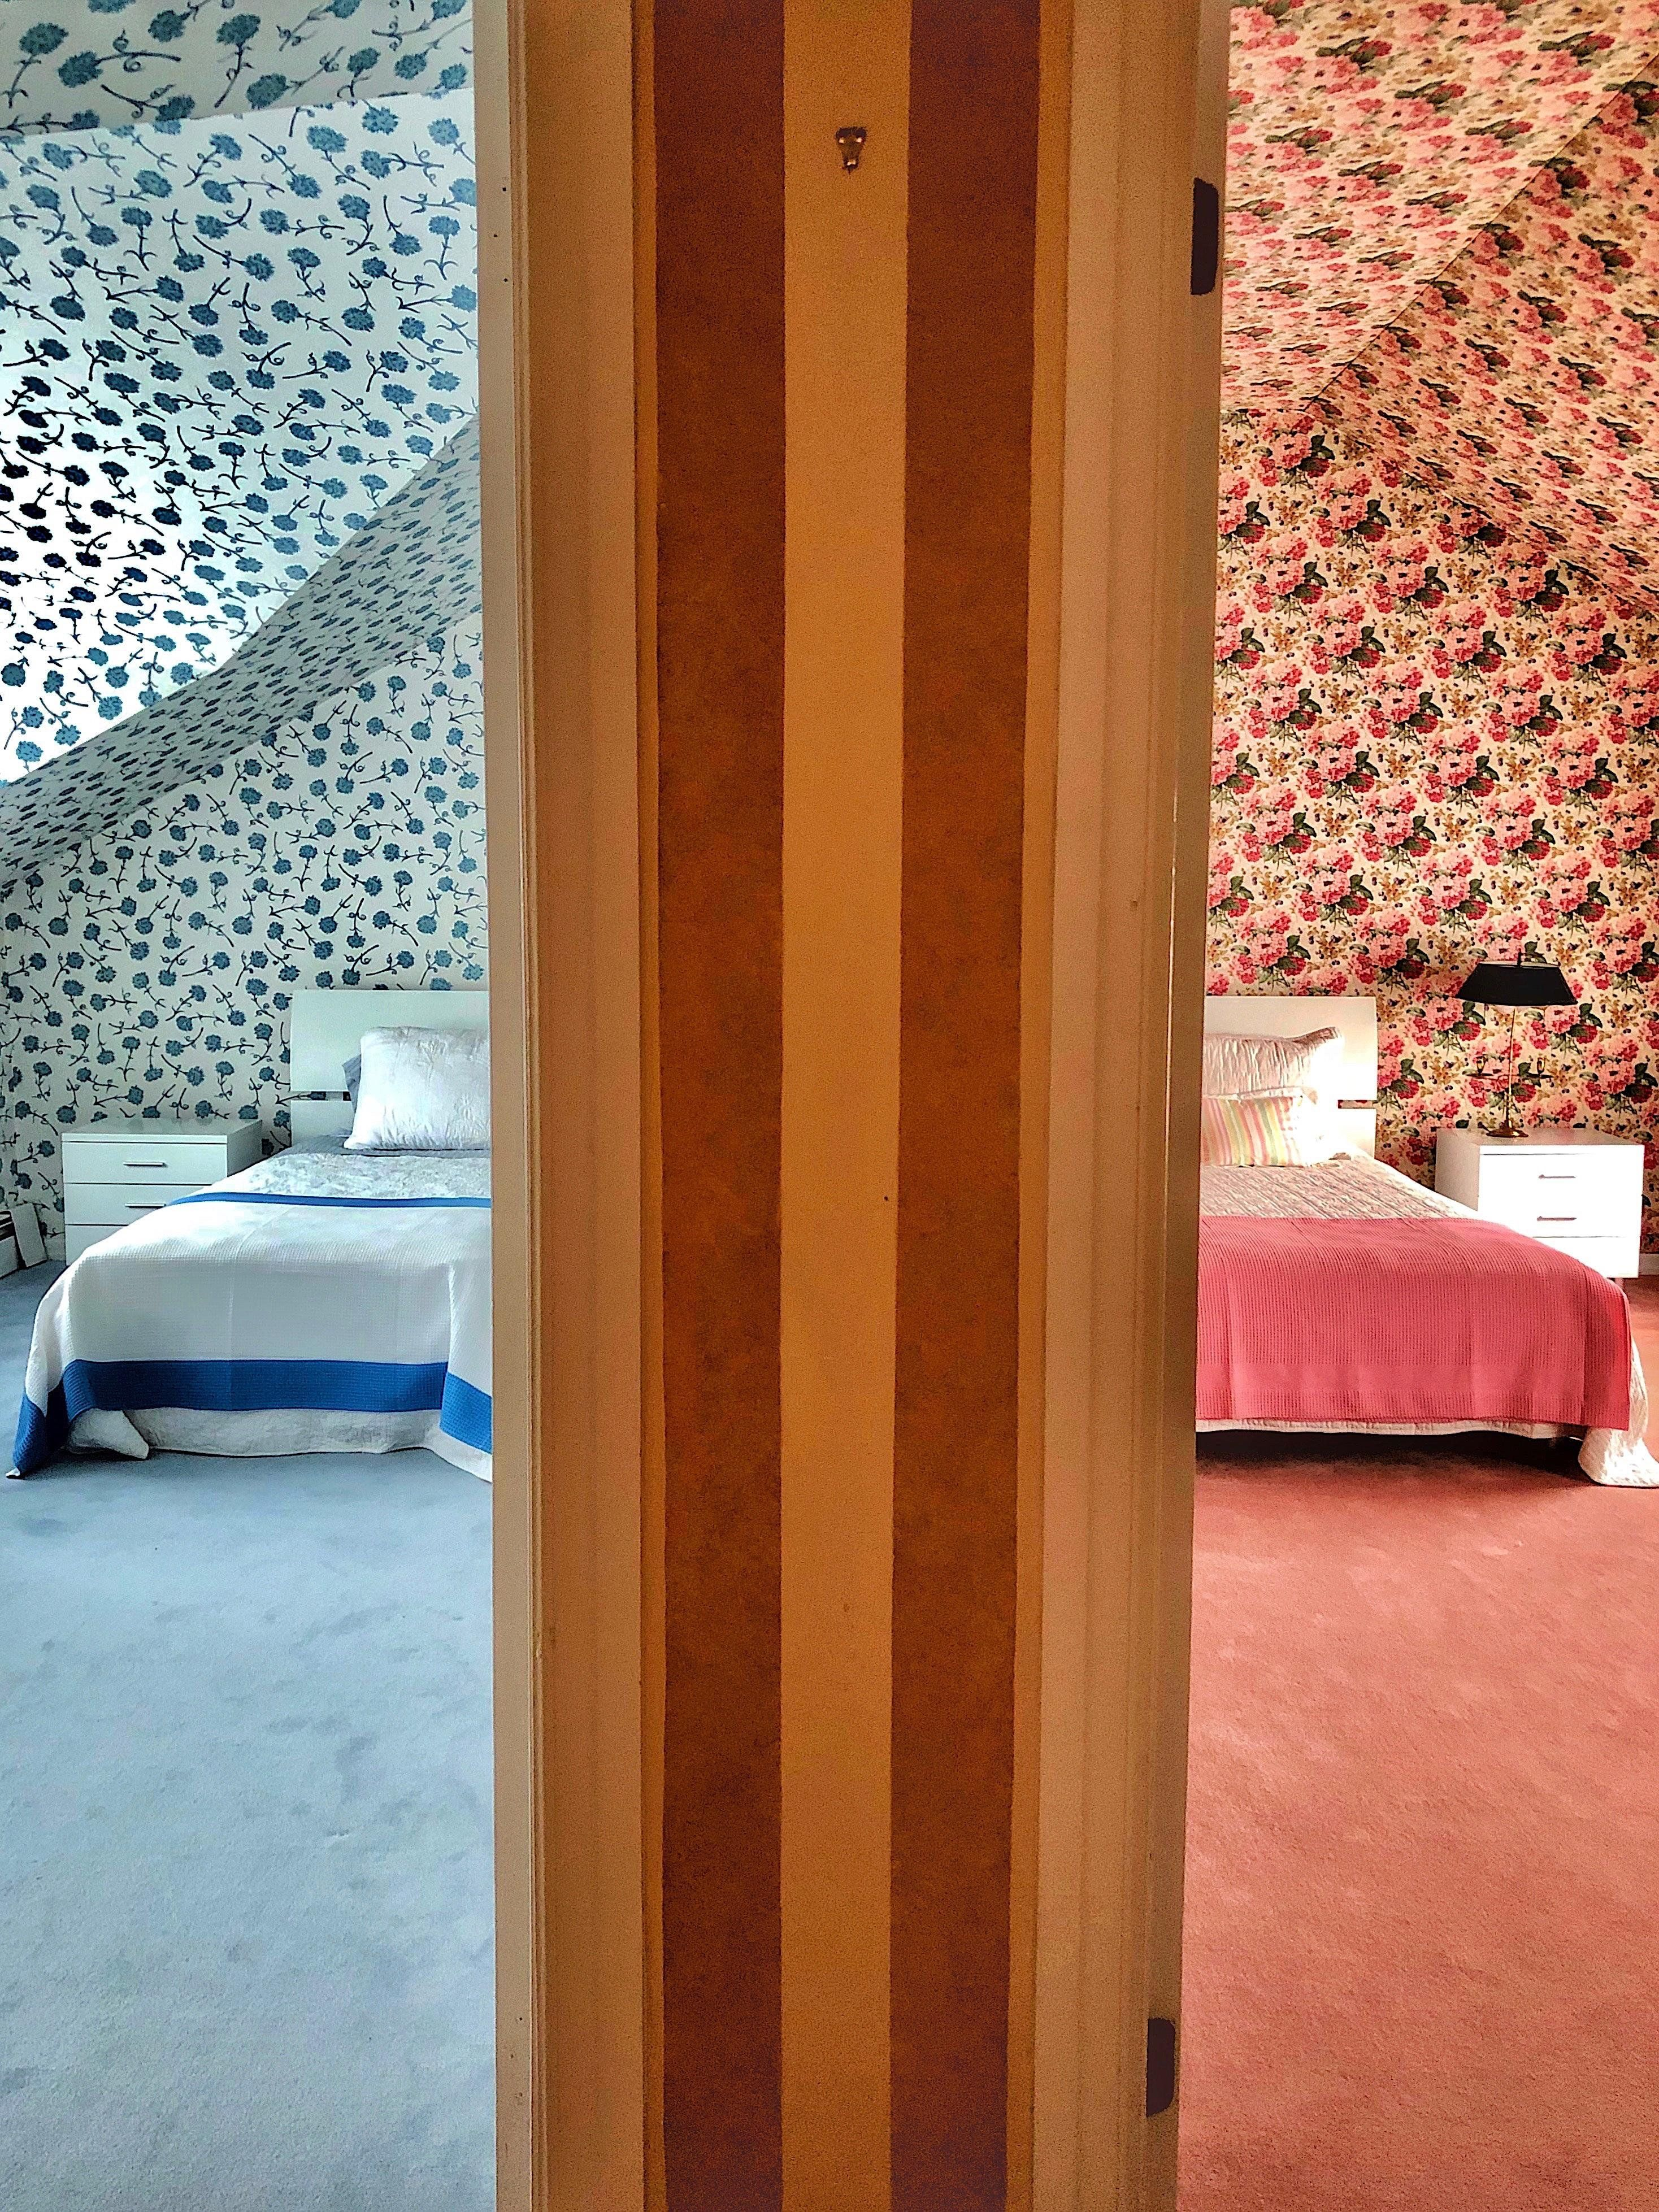 Adjacent Bedrooms AccidentalWesAnderson Interior